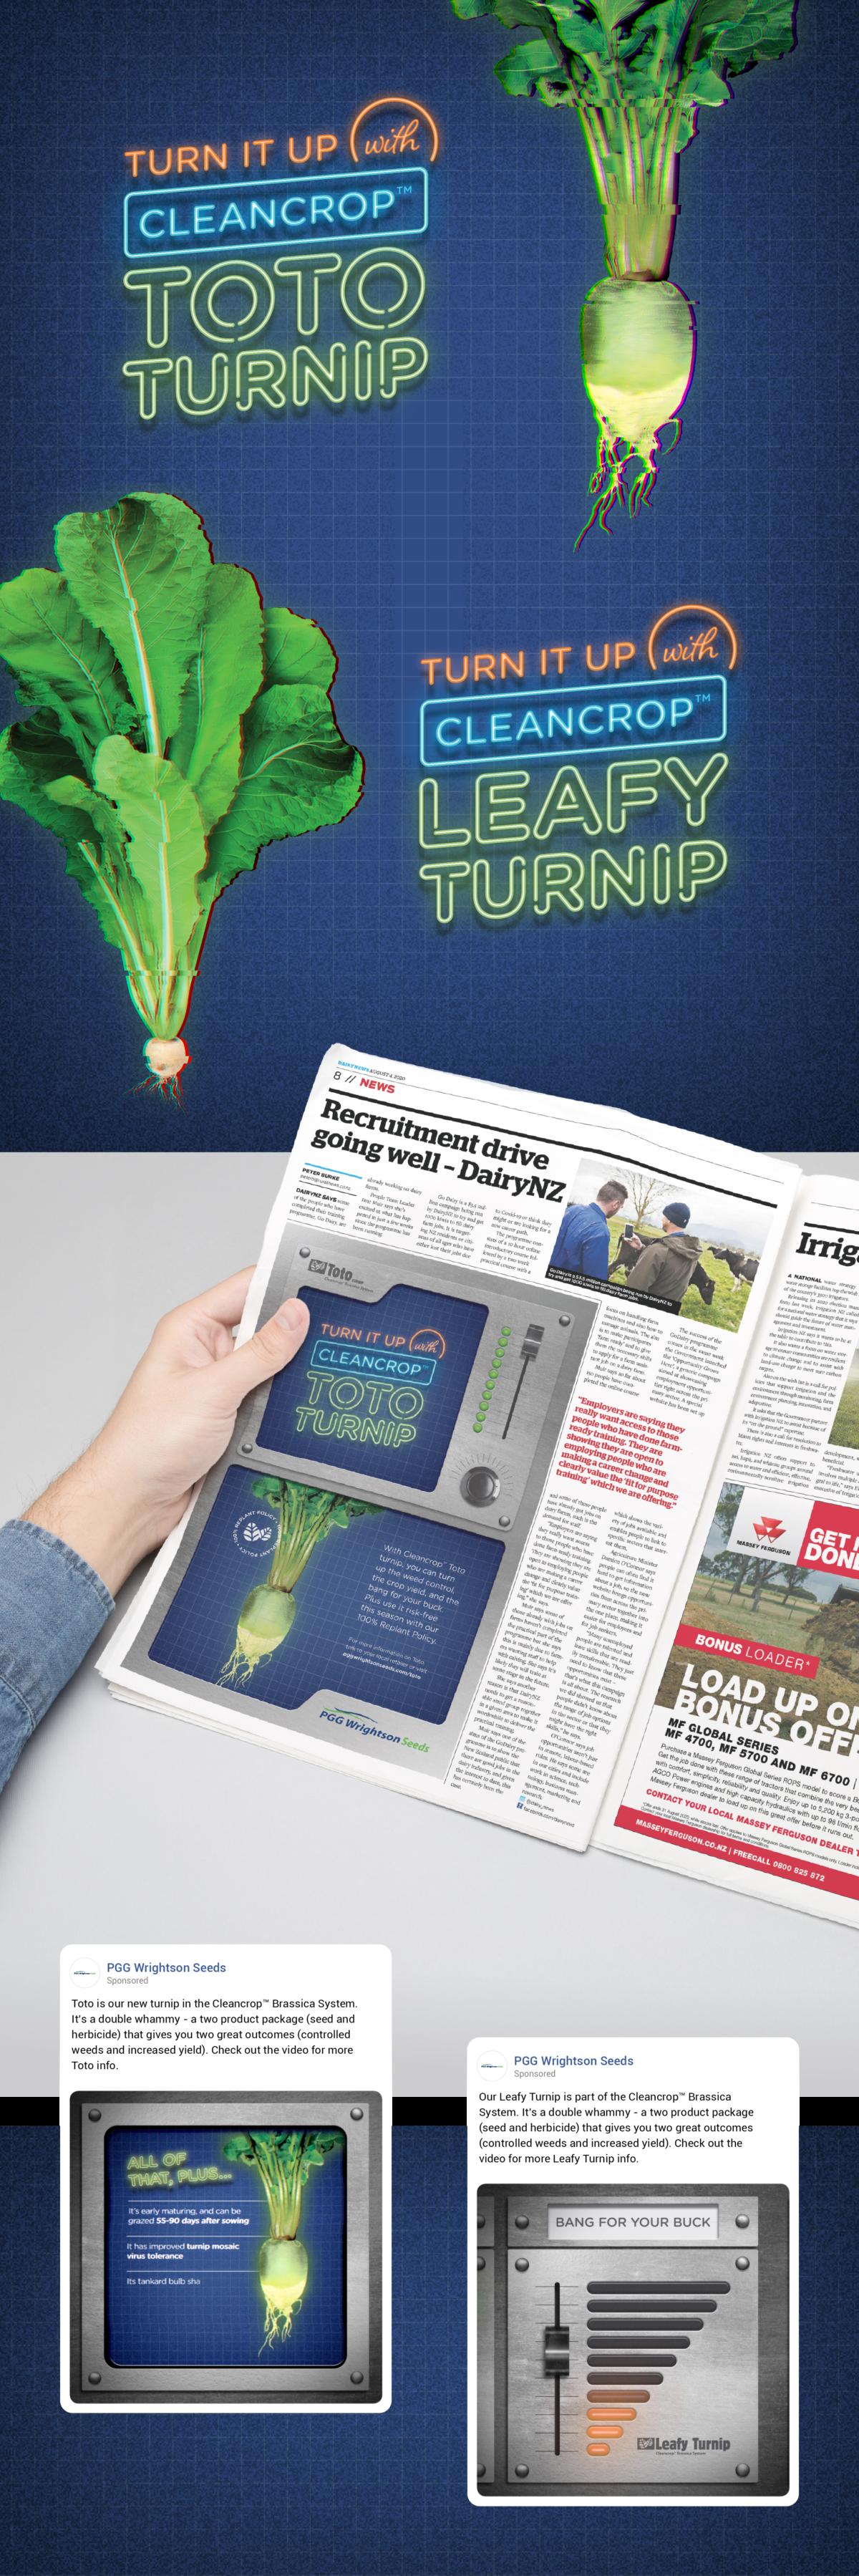 PGWS Turnip Campaign Portfolio 2